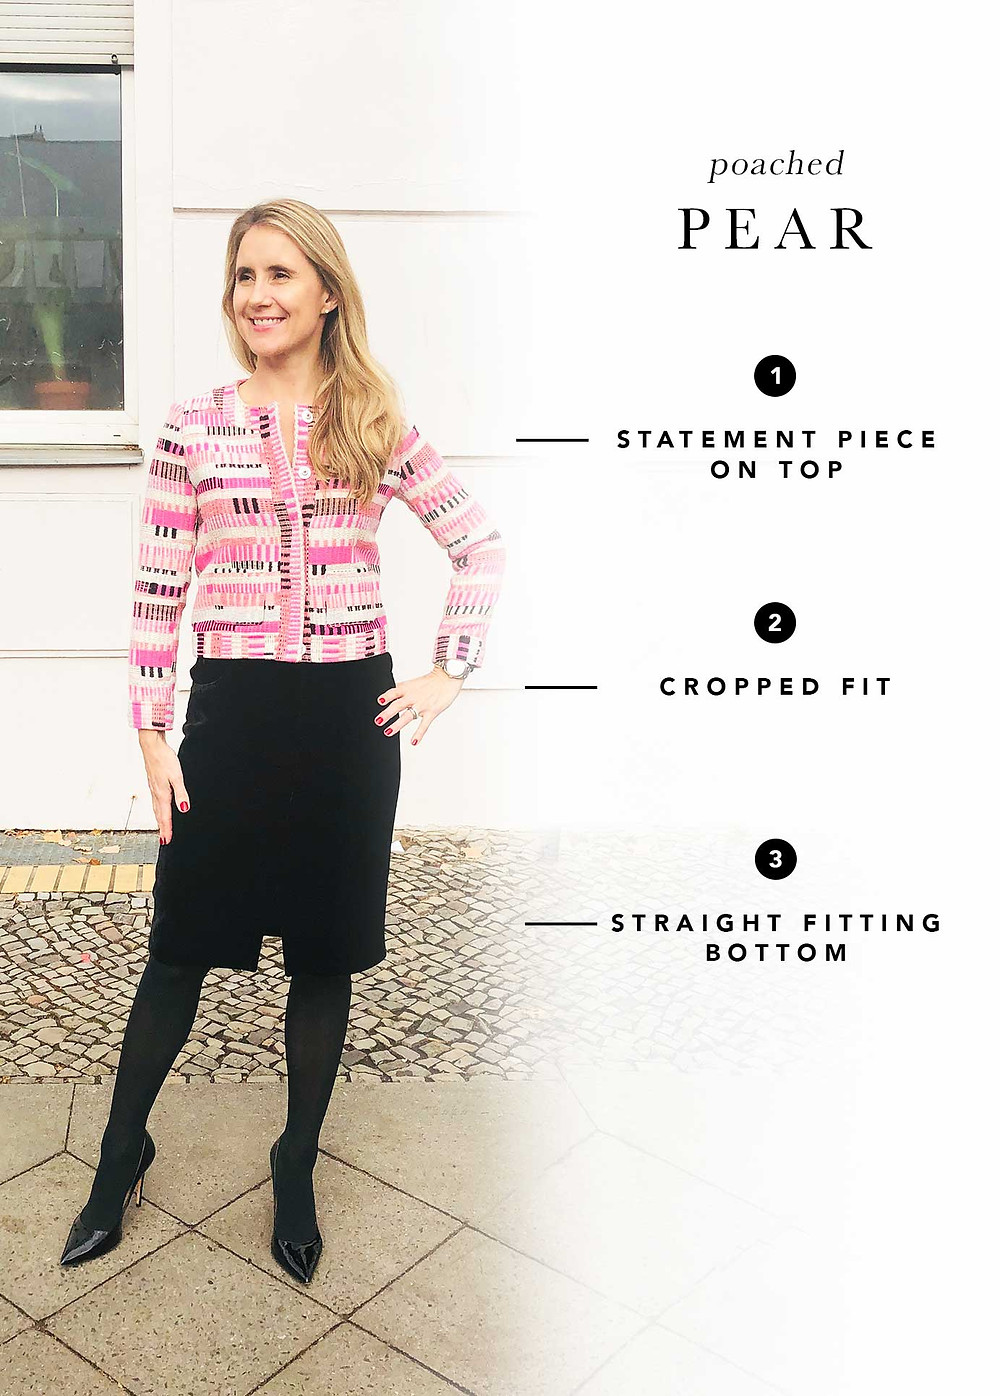 j.jackman business outfit tipps pear shape